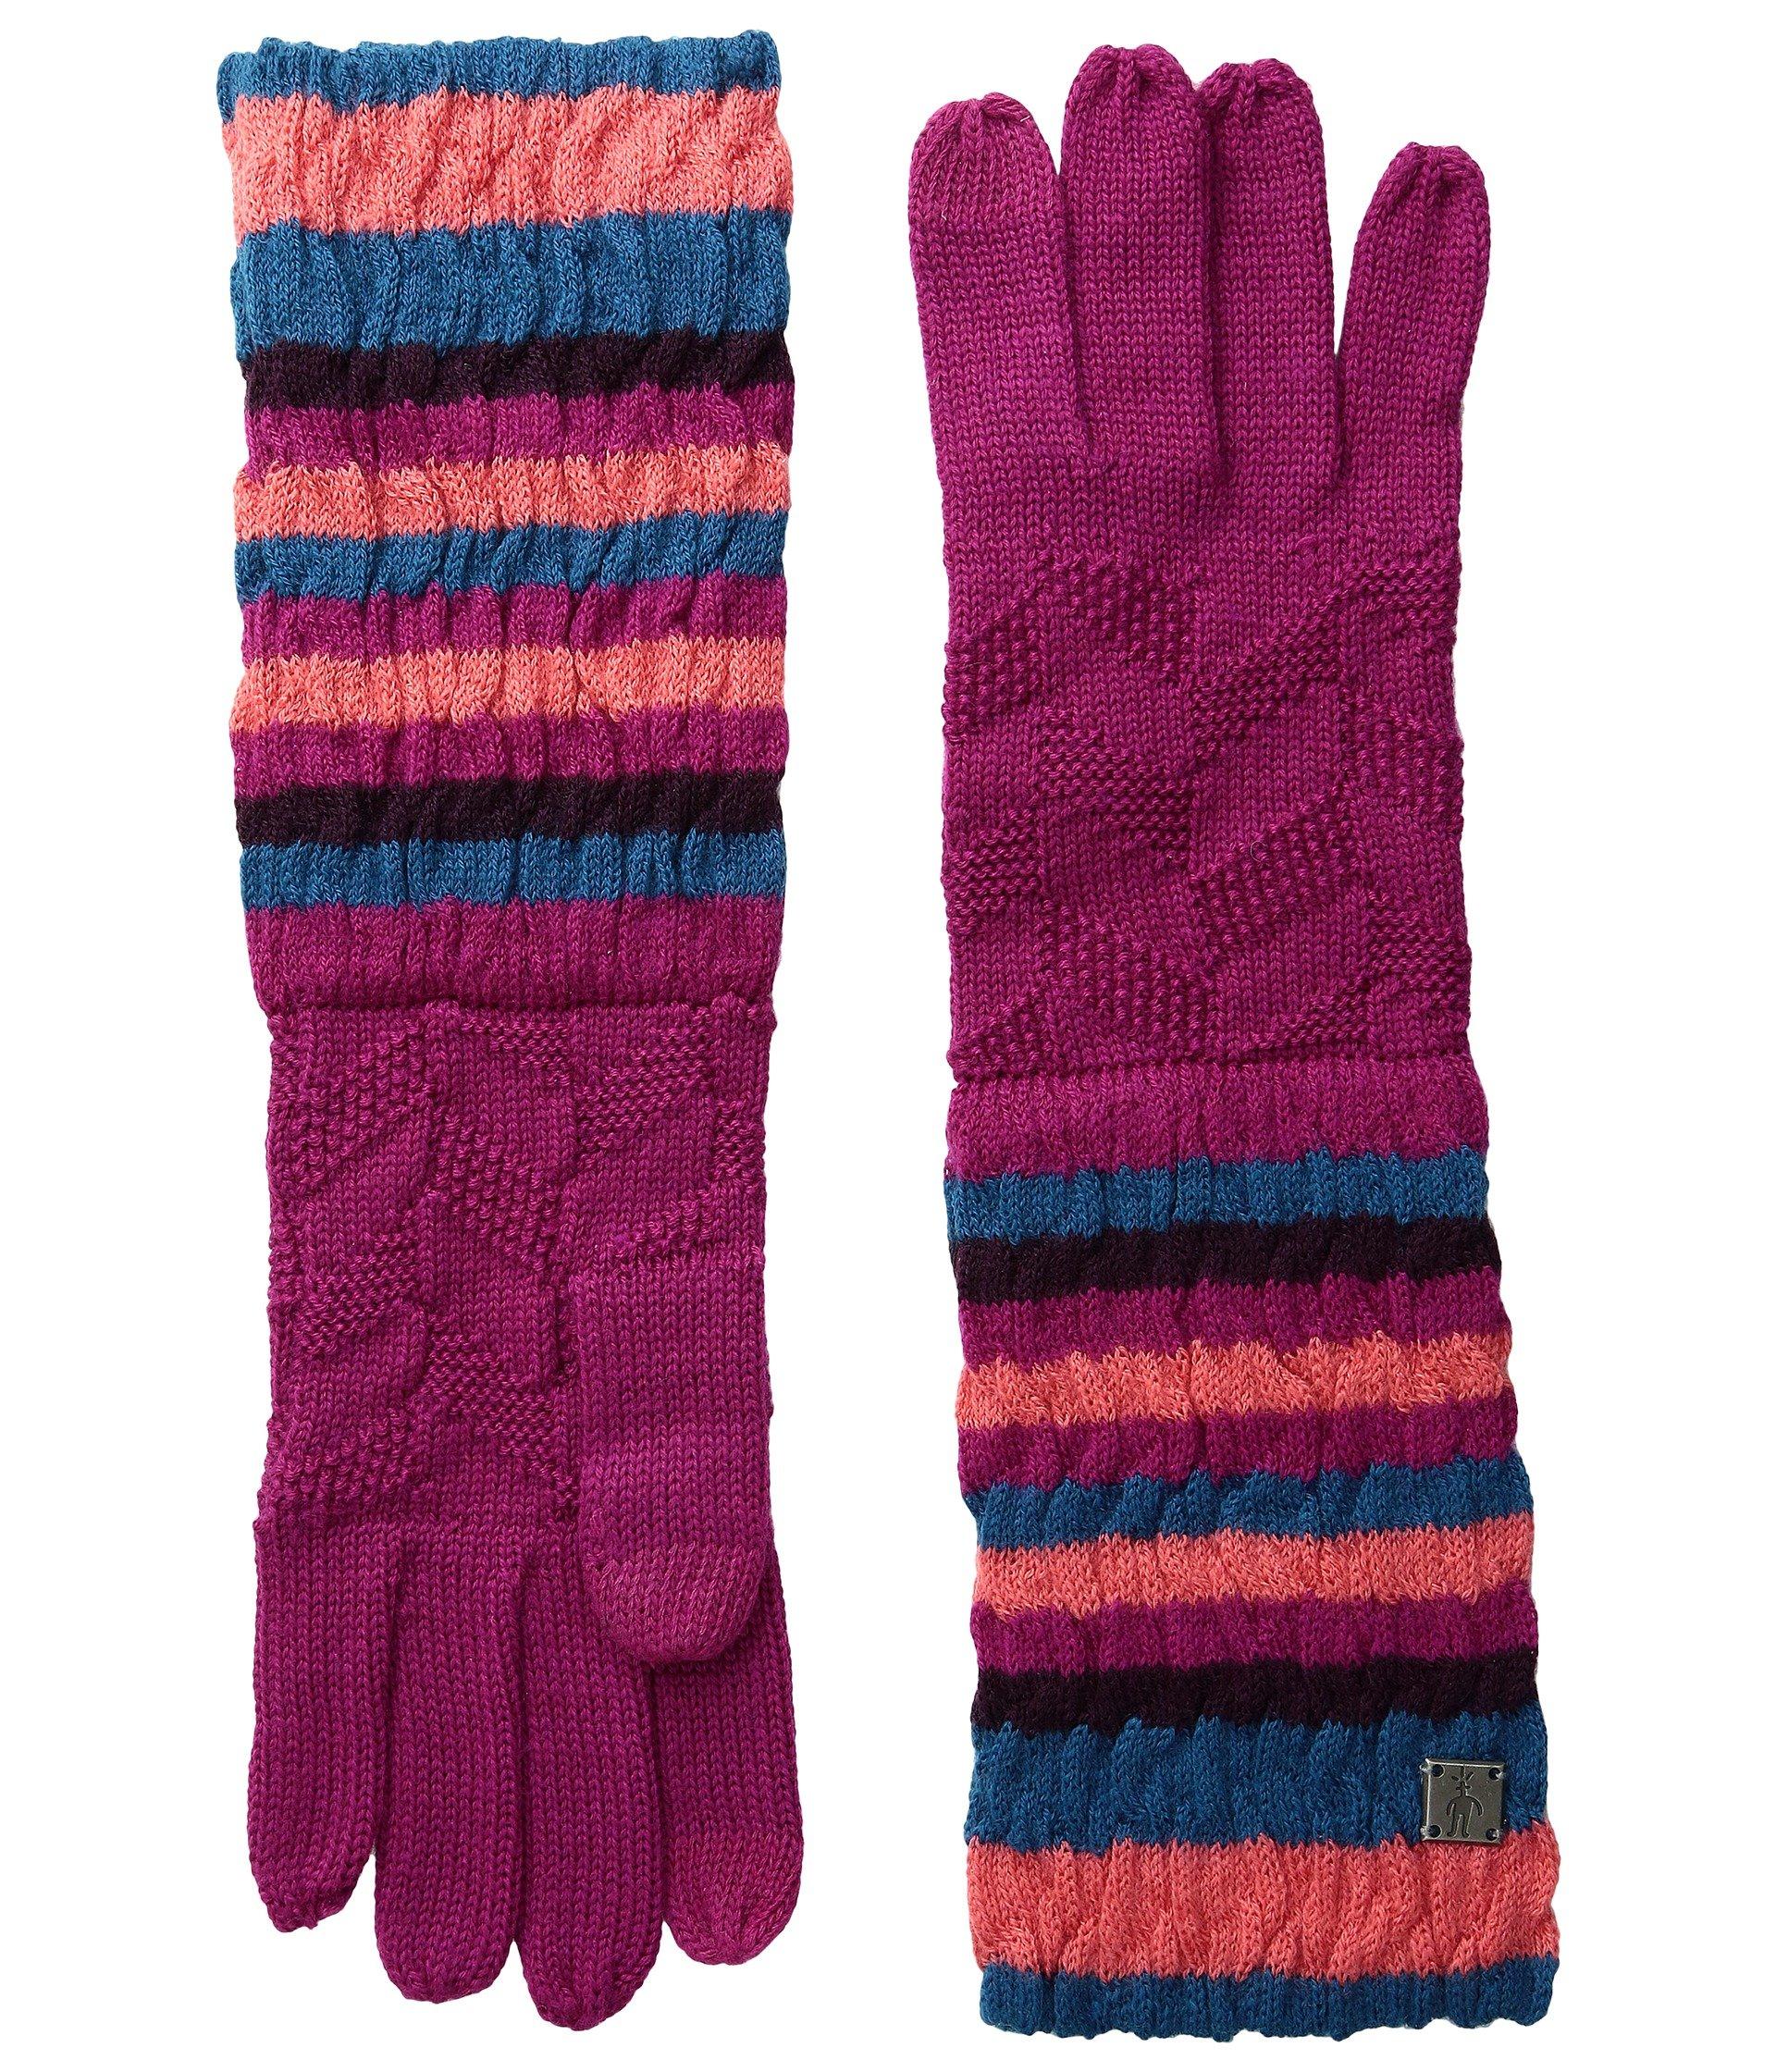 Guantes para Hombre Smartwool Striped Chevron Gloves  + Smartwool en VeoyCompro.net